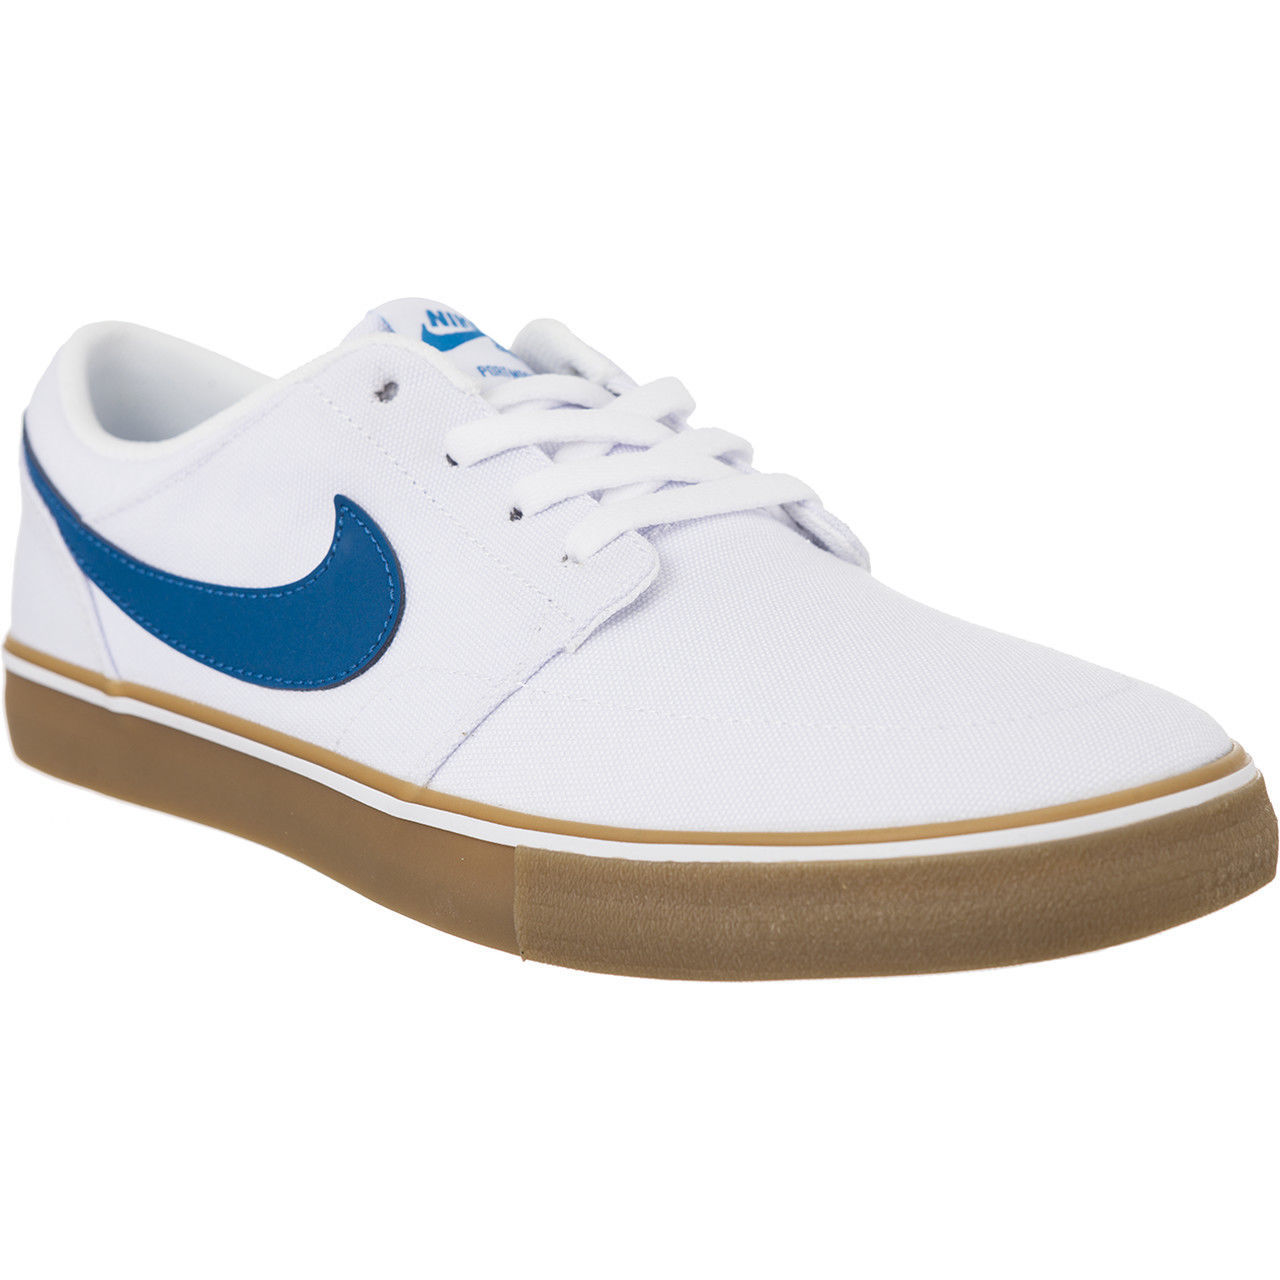 Nike SB Portmore II Solar CNVS Canvas White/Blue Mens Skate Shoes 880268-149 image 2